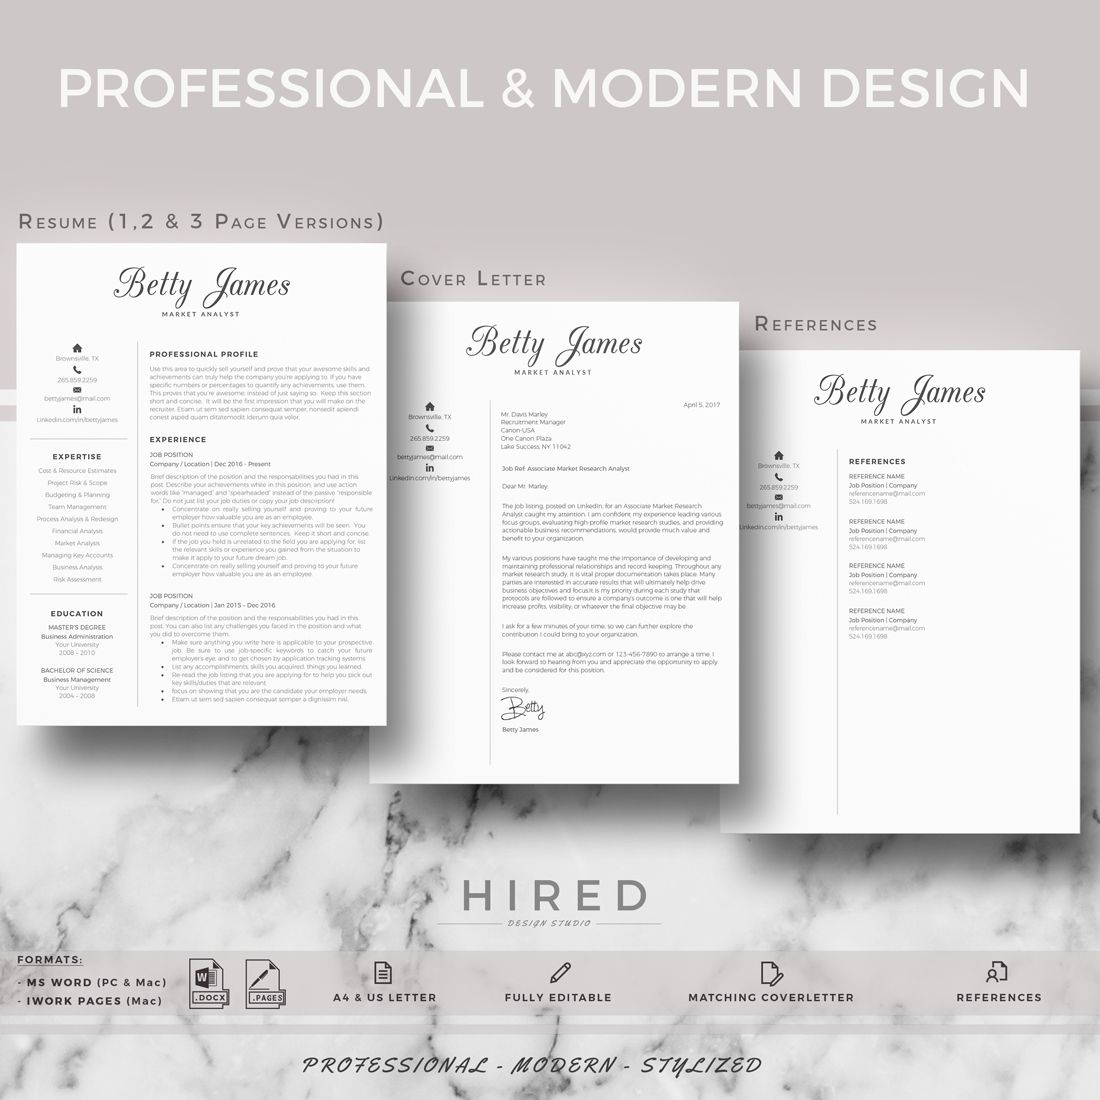 Resume template CV template Professional & modern